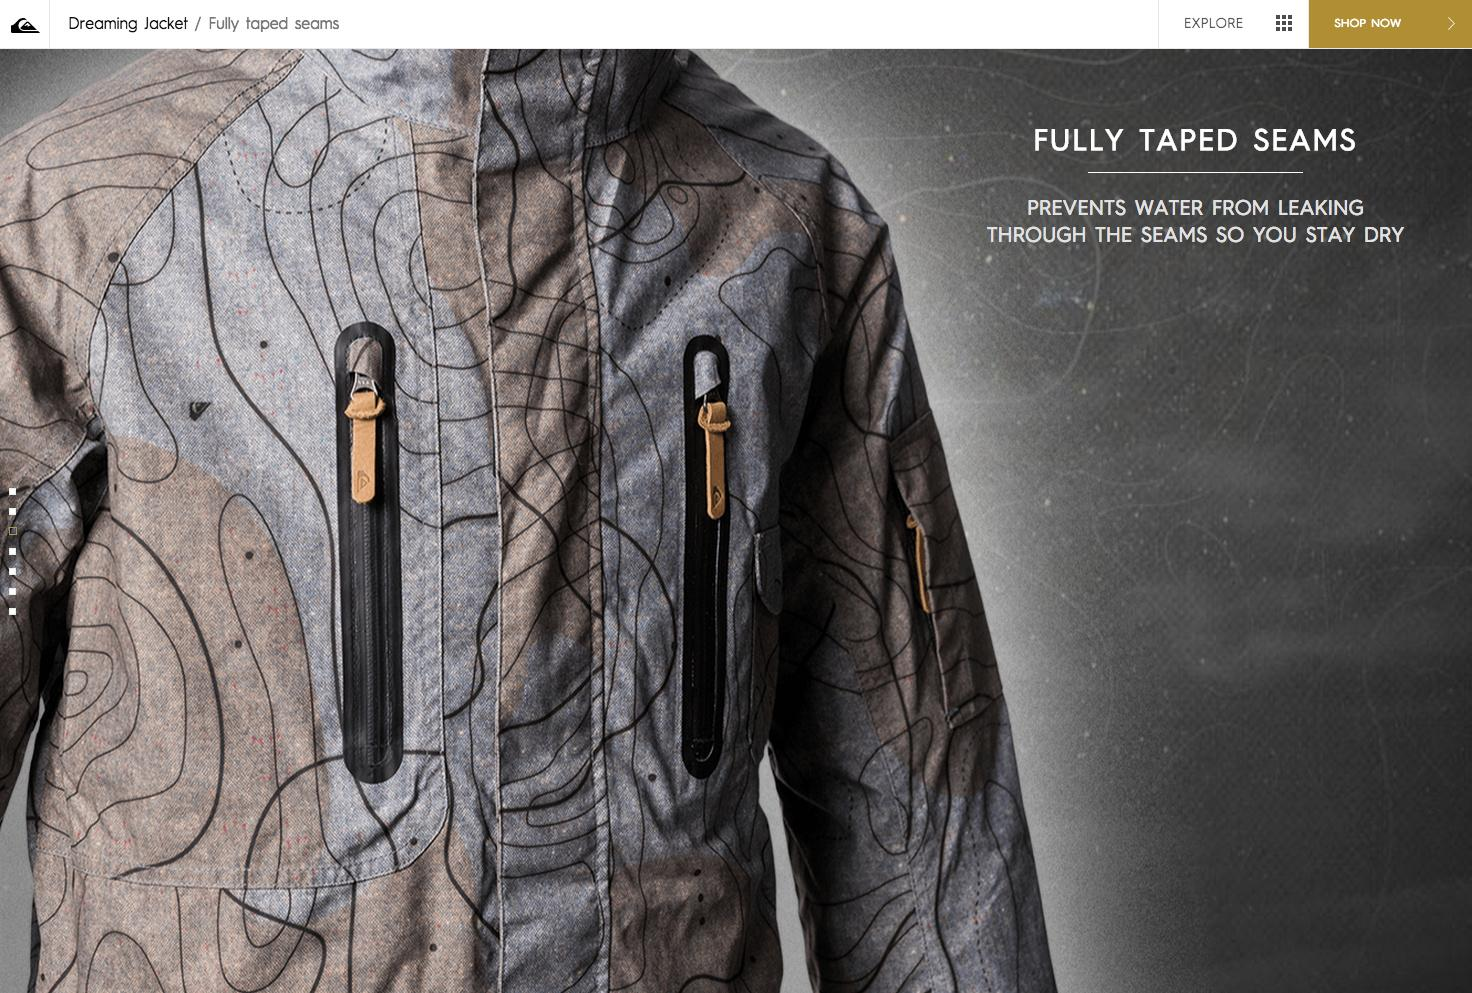 Quiksilver dreaming jacket